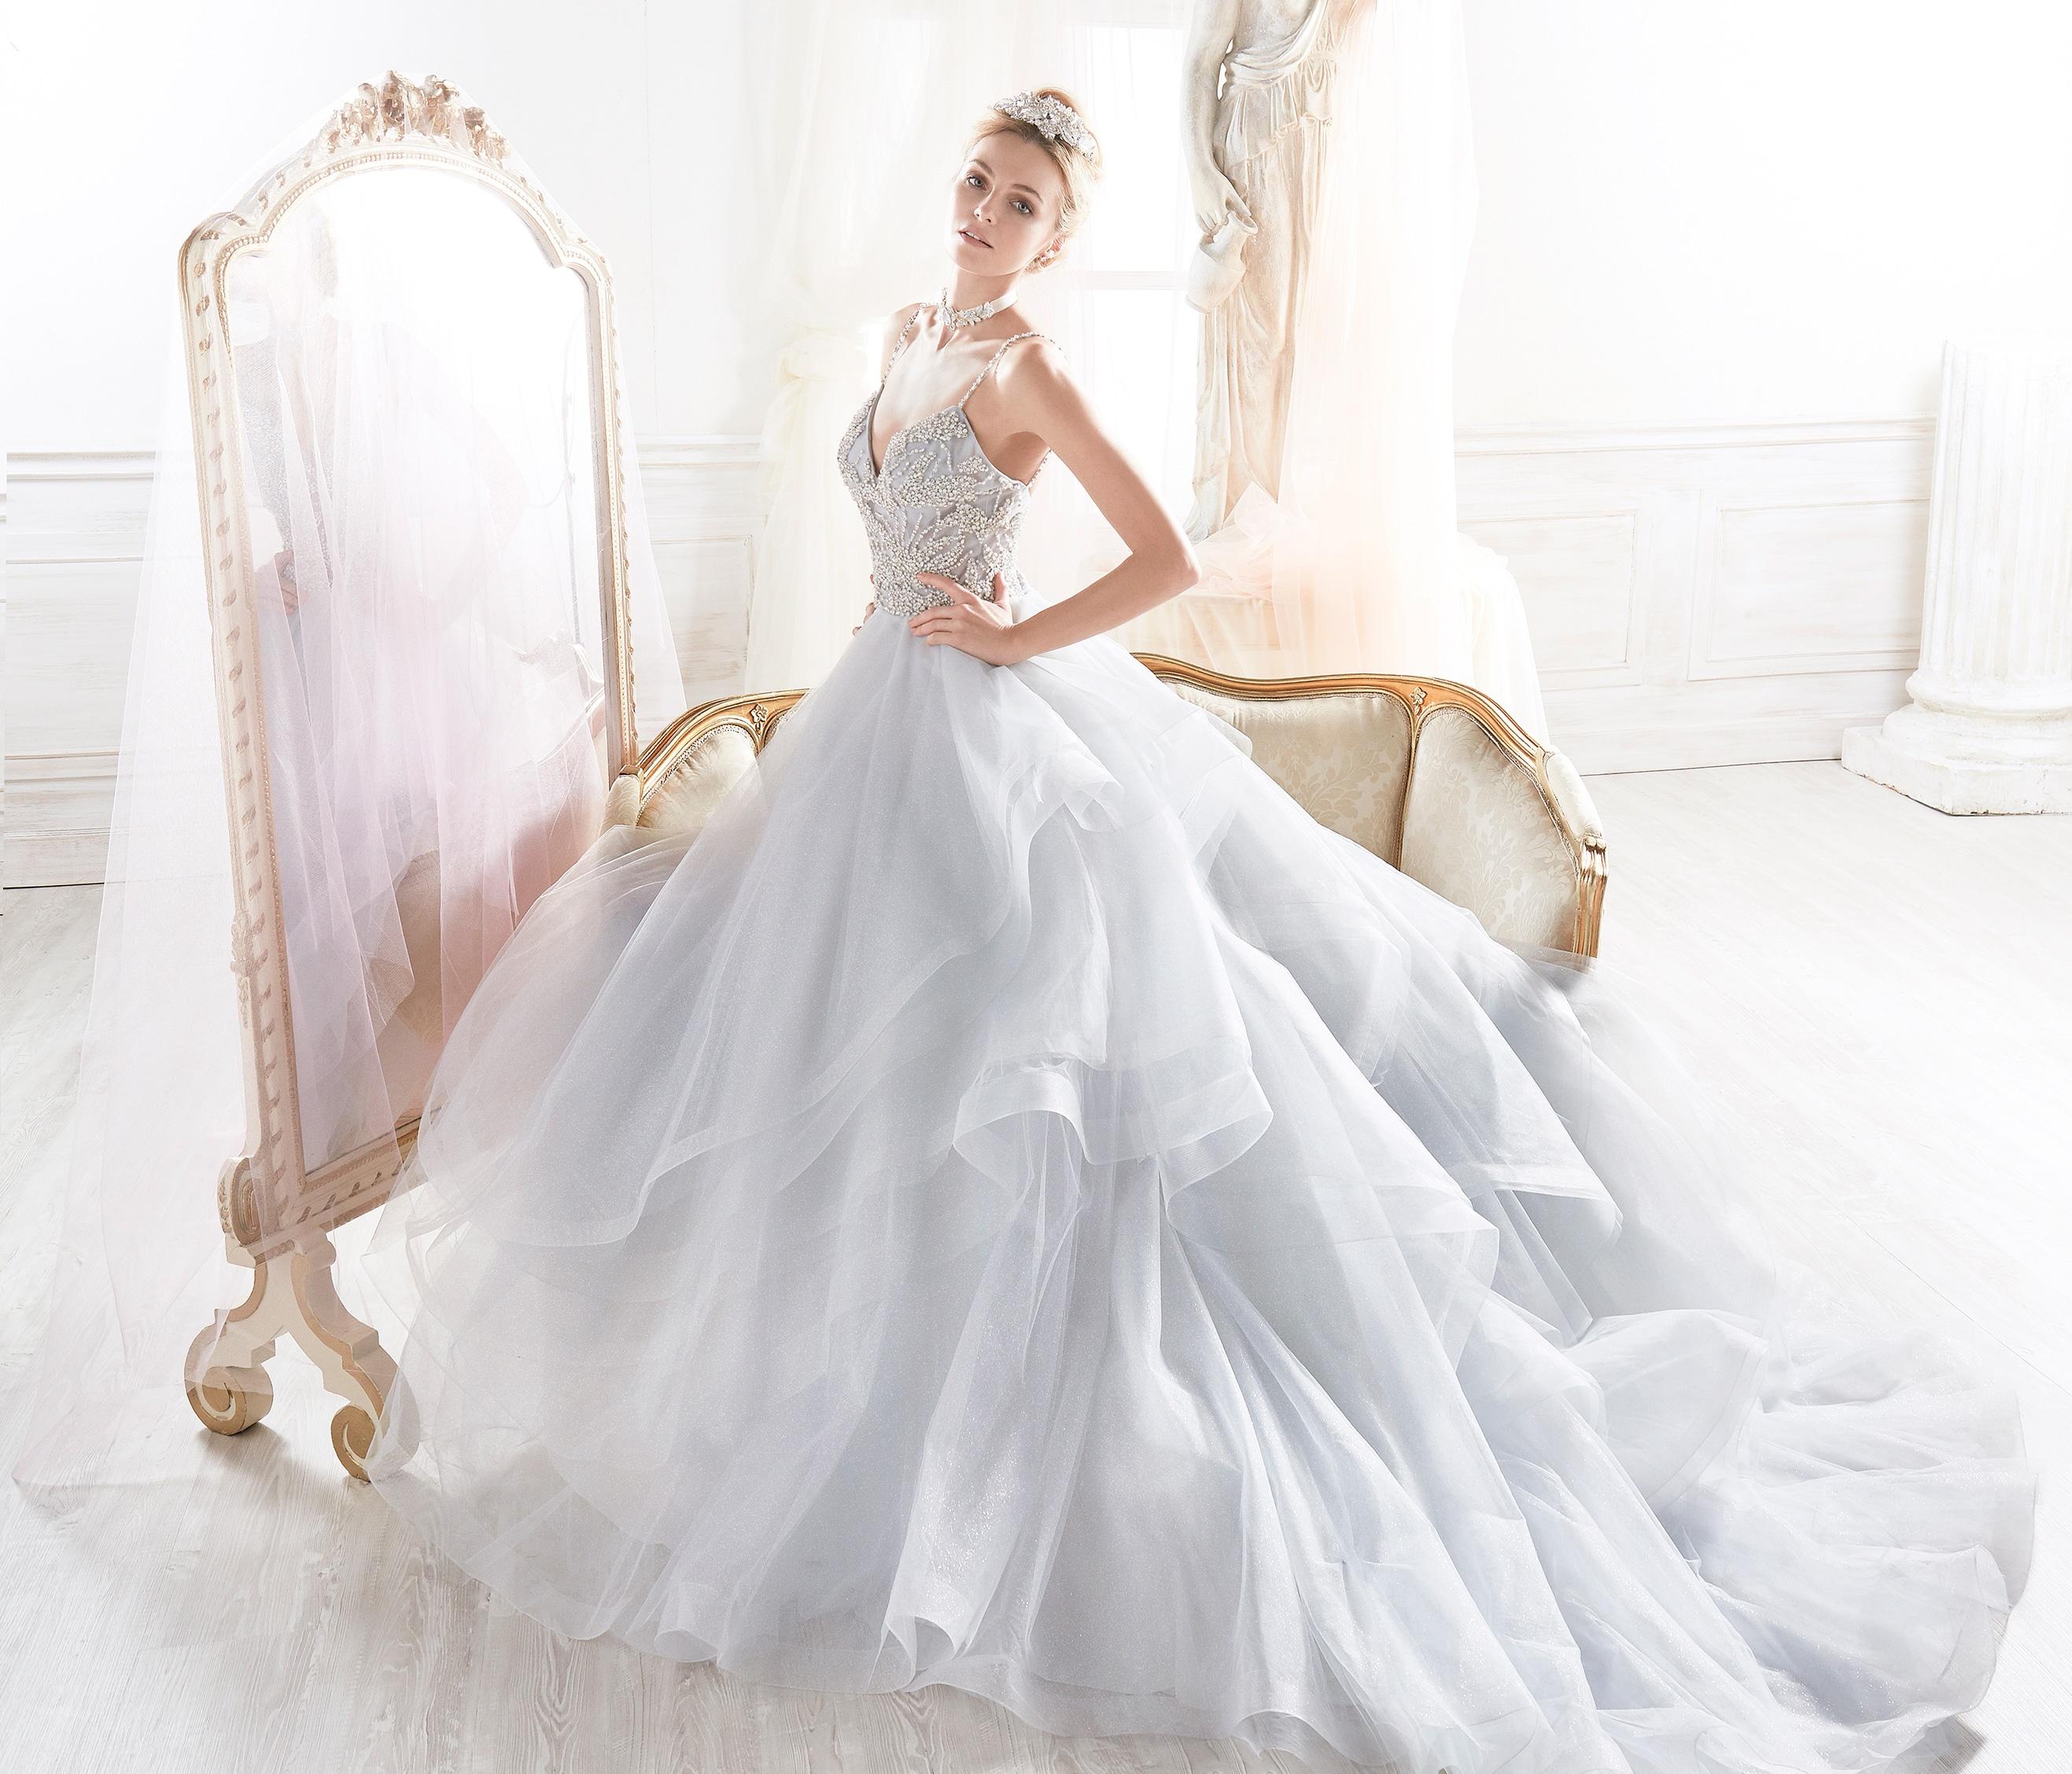 trajes para novia: Vestido de novia con volantes